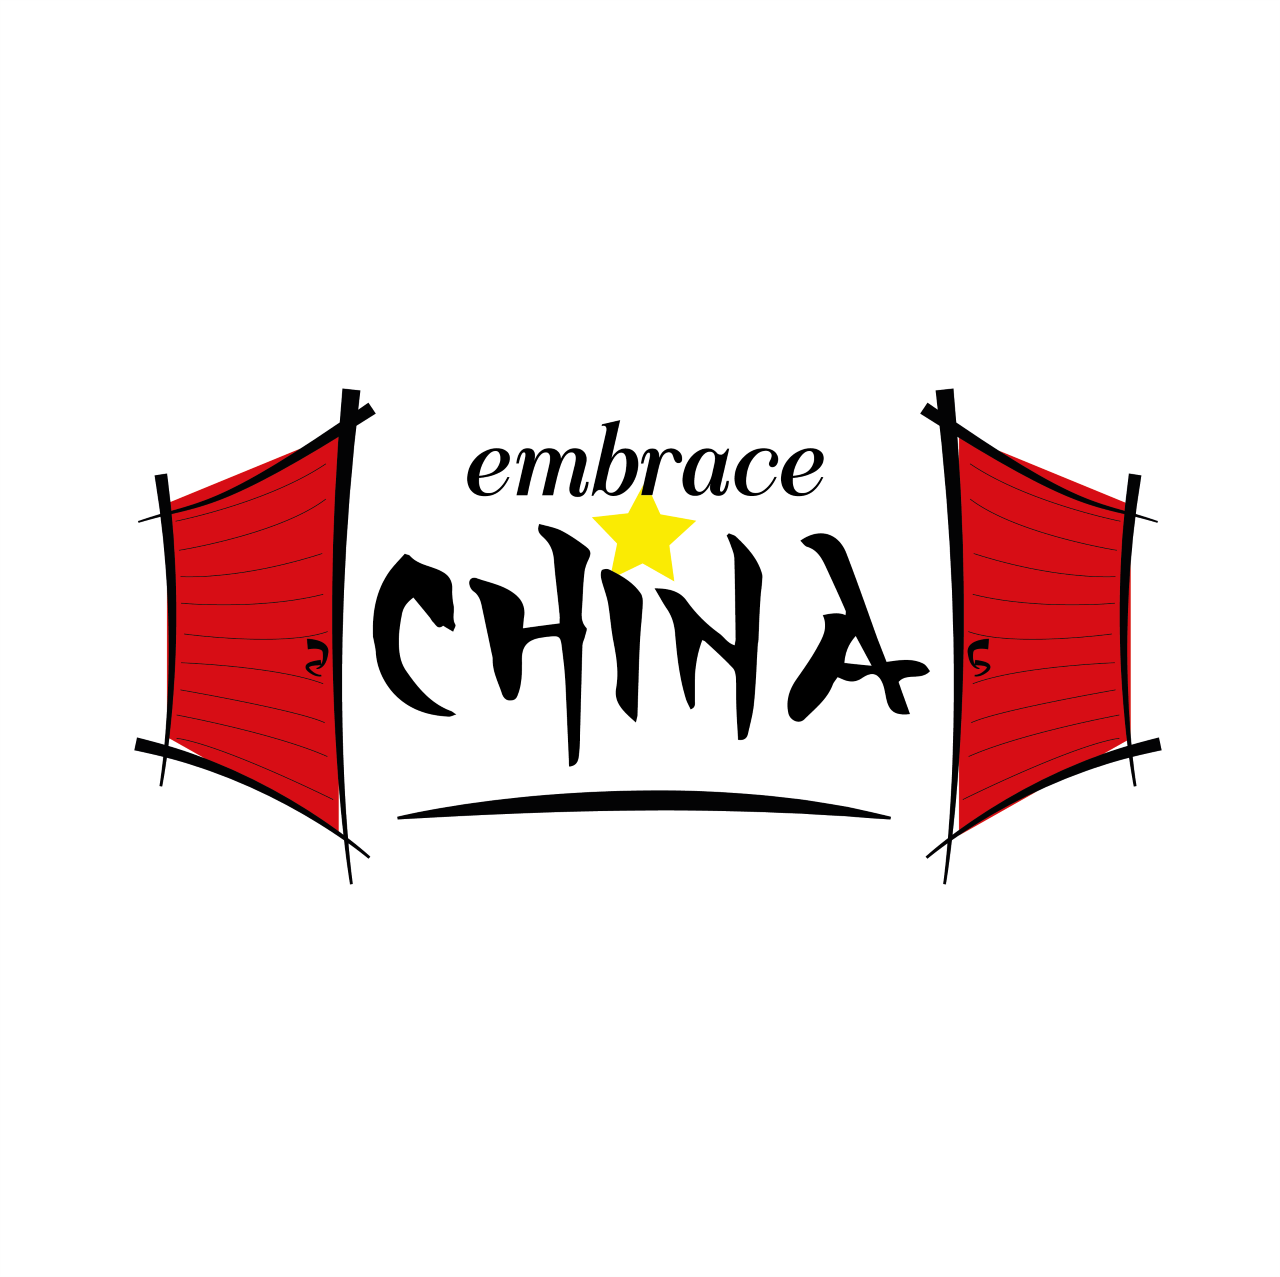 Embrace CHINA primary image